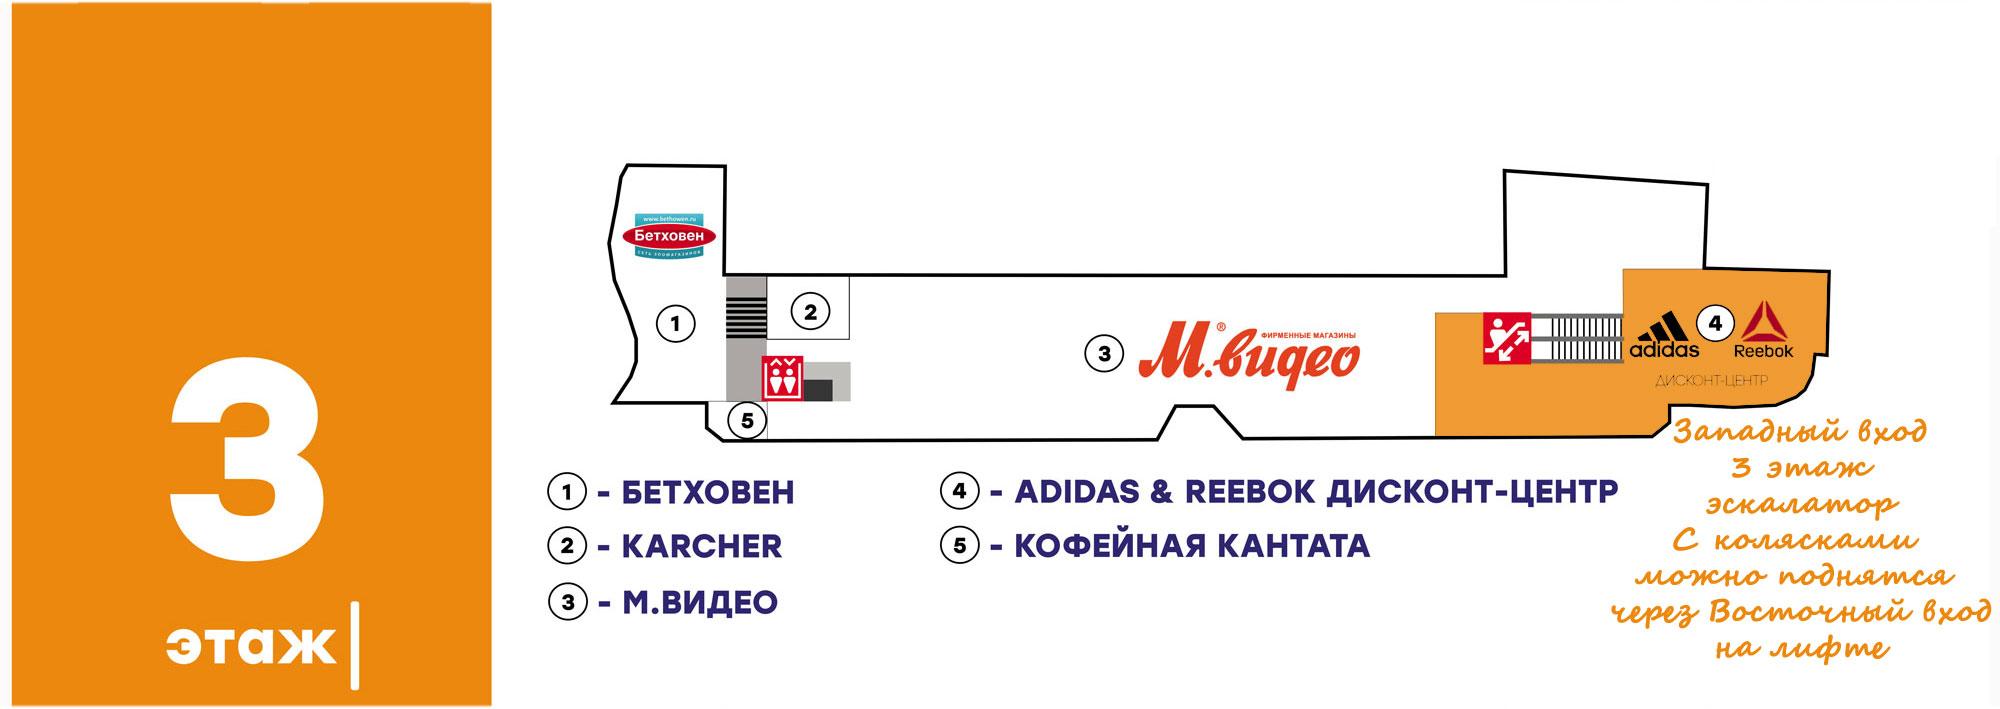 "adidas & Reebok дисконт центр в ТРЦ ""Вертикаль"""